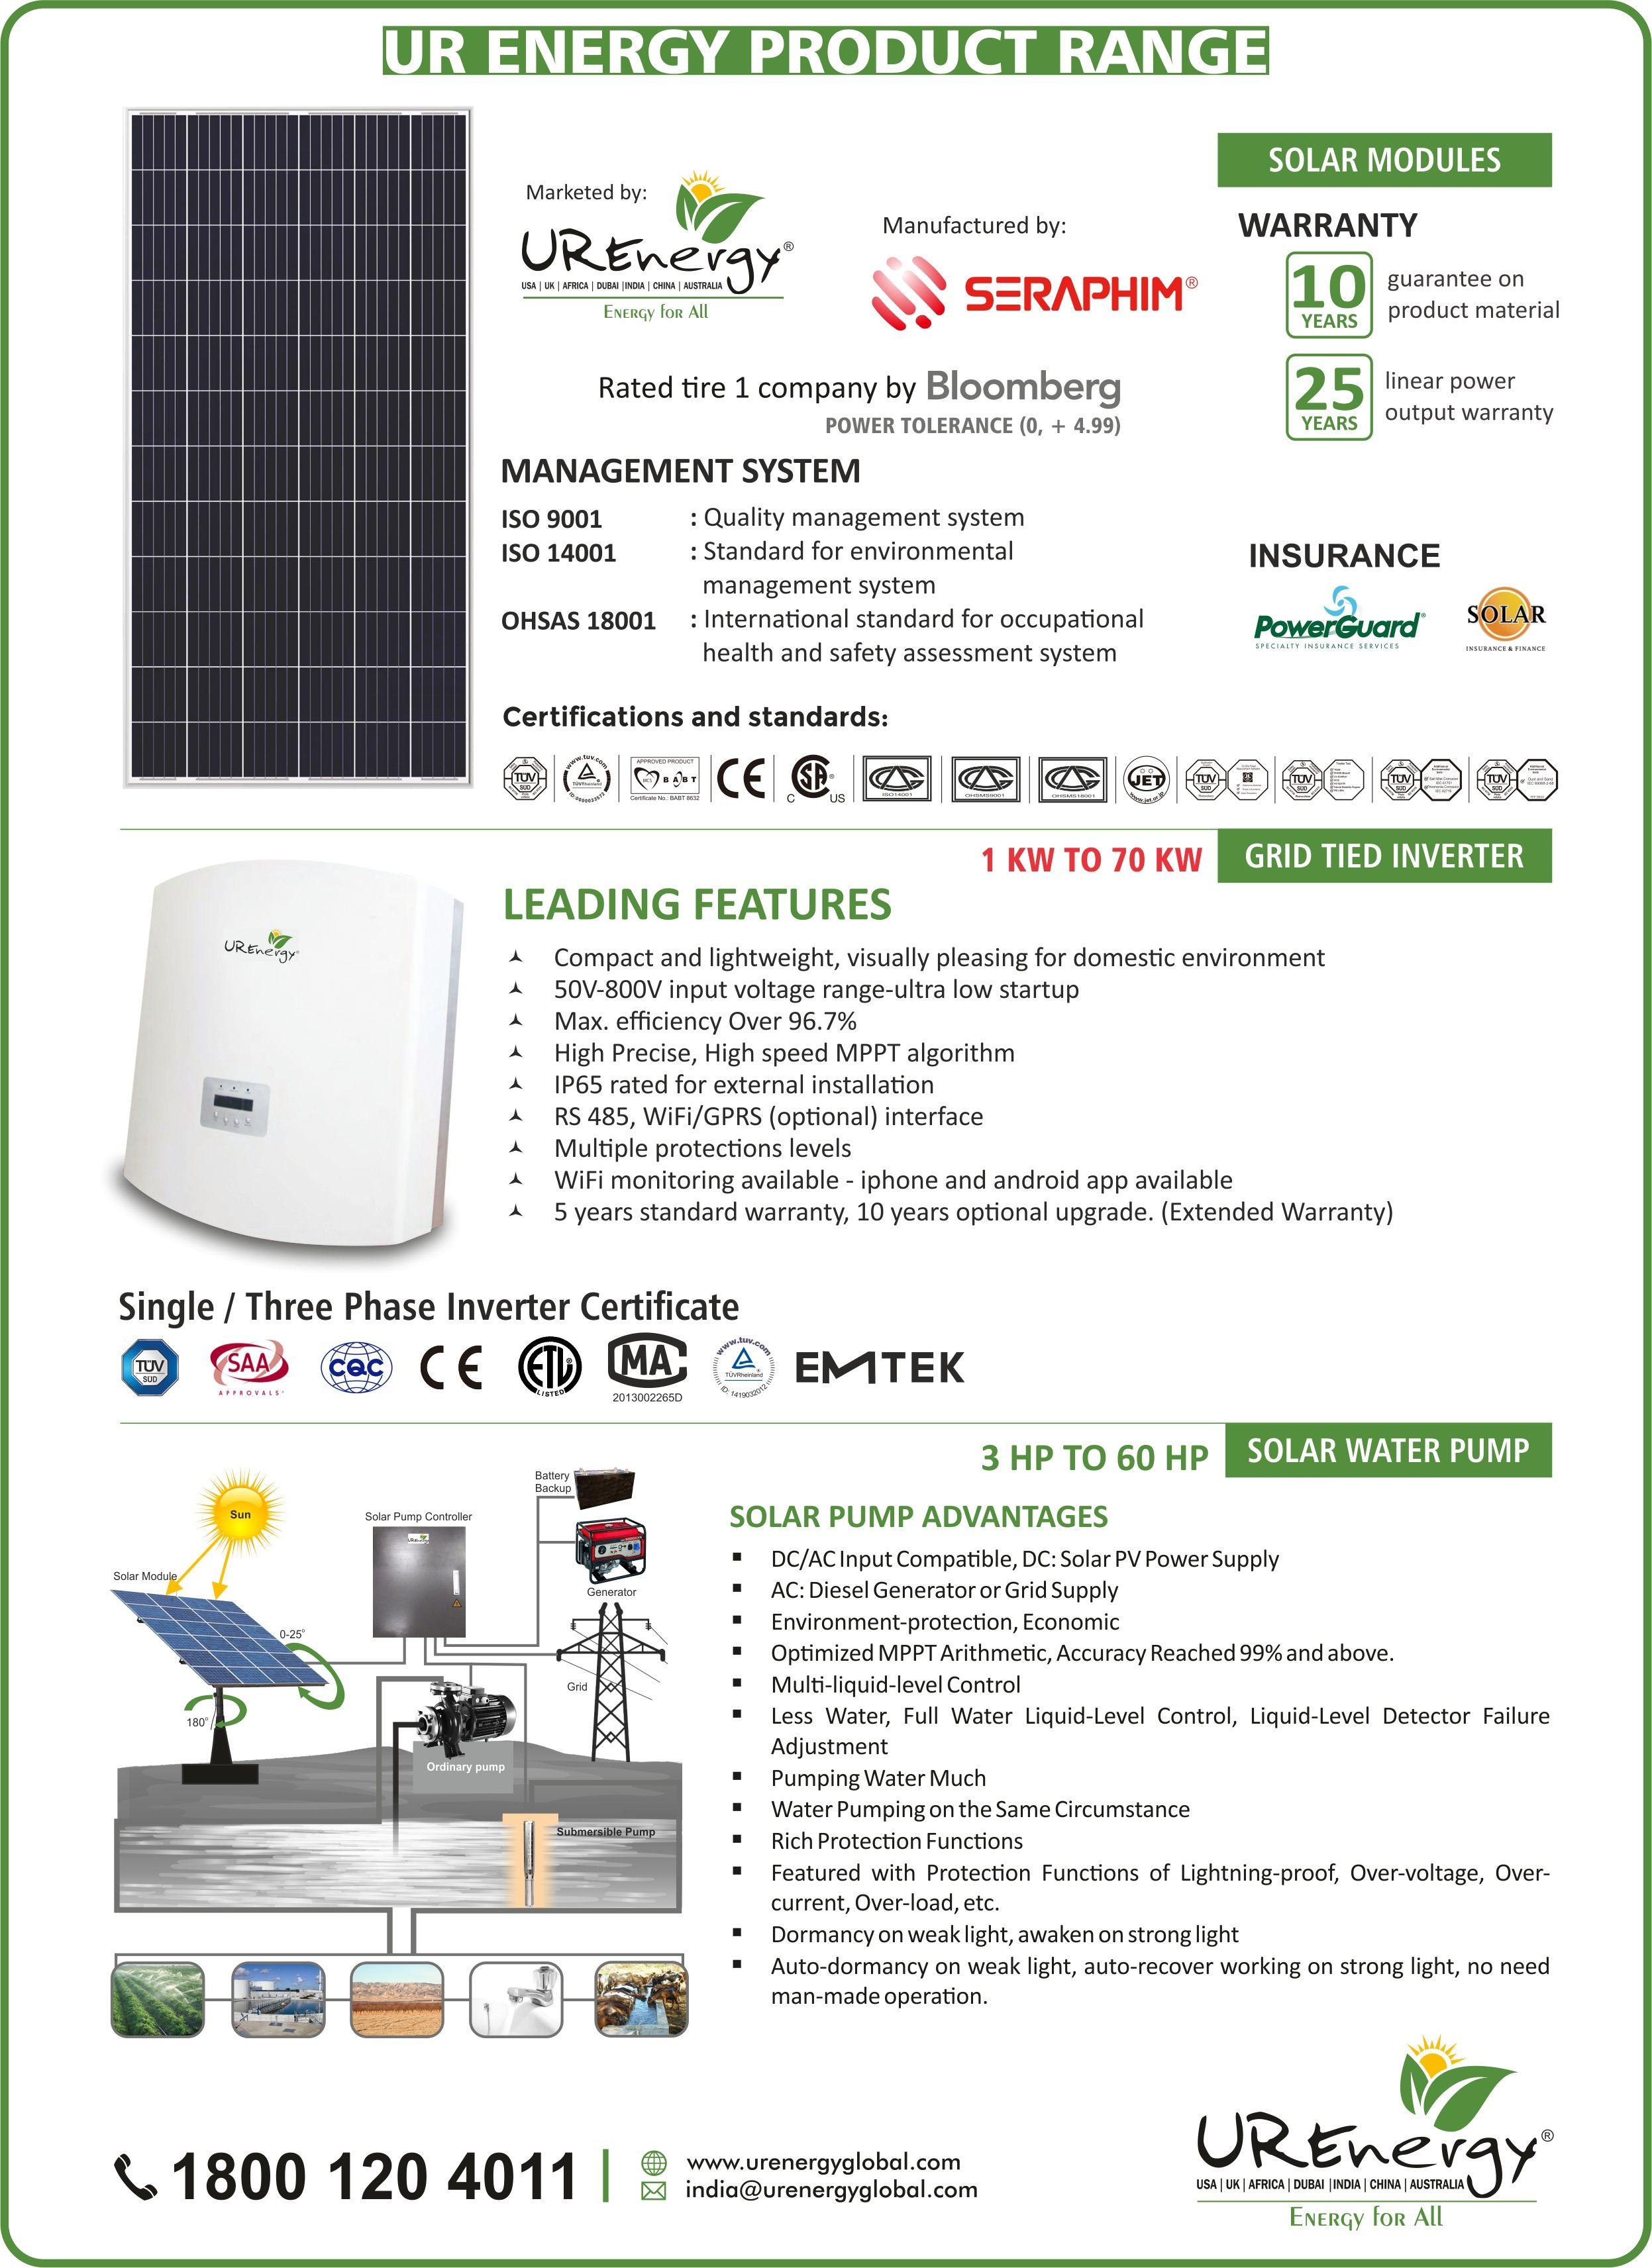 Rooftop Solar Panel Inverters Water Pump Solar Epc Gujarat India U R Energy Solar Module Solar Panel Inverter Solar Panels Design